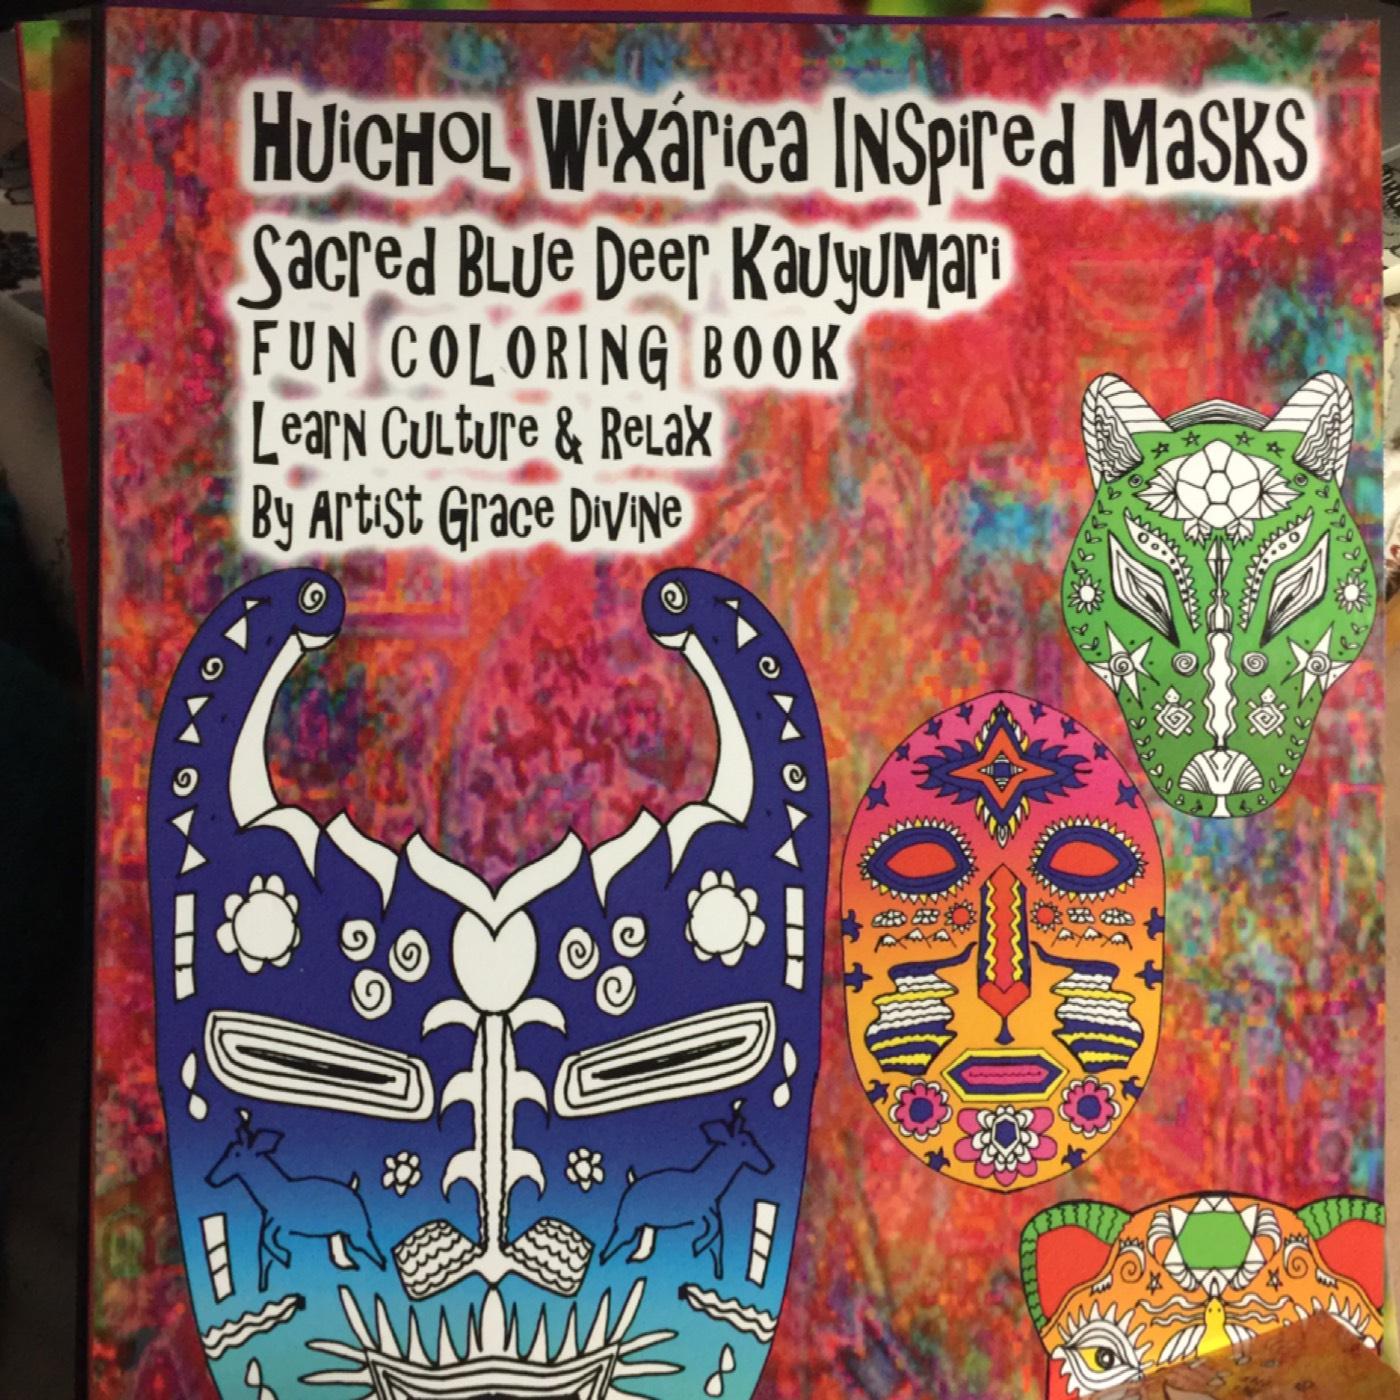 Divine Grace coloring #14, Download drawings